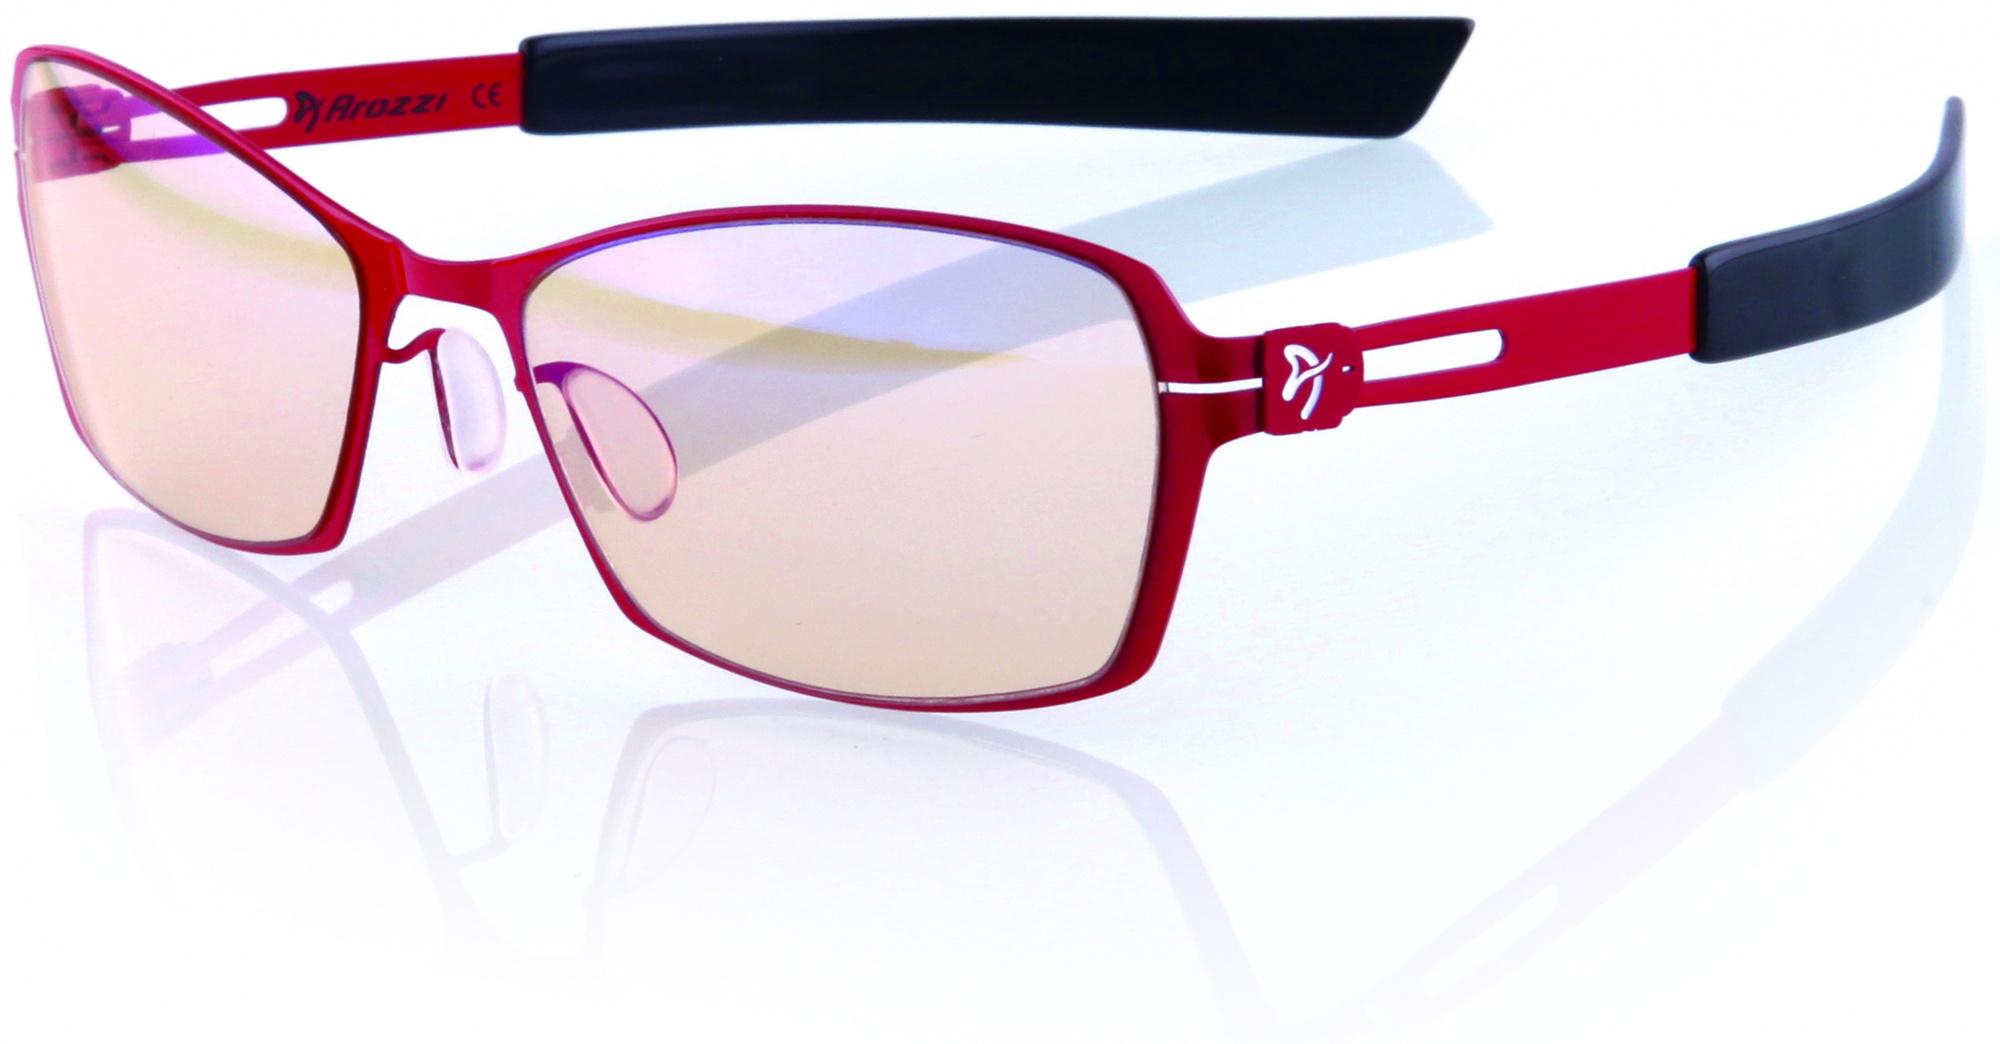 arozzi Очки для компьютера Arozzi Visione VX-500 (Red) VX500-5